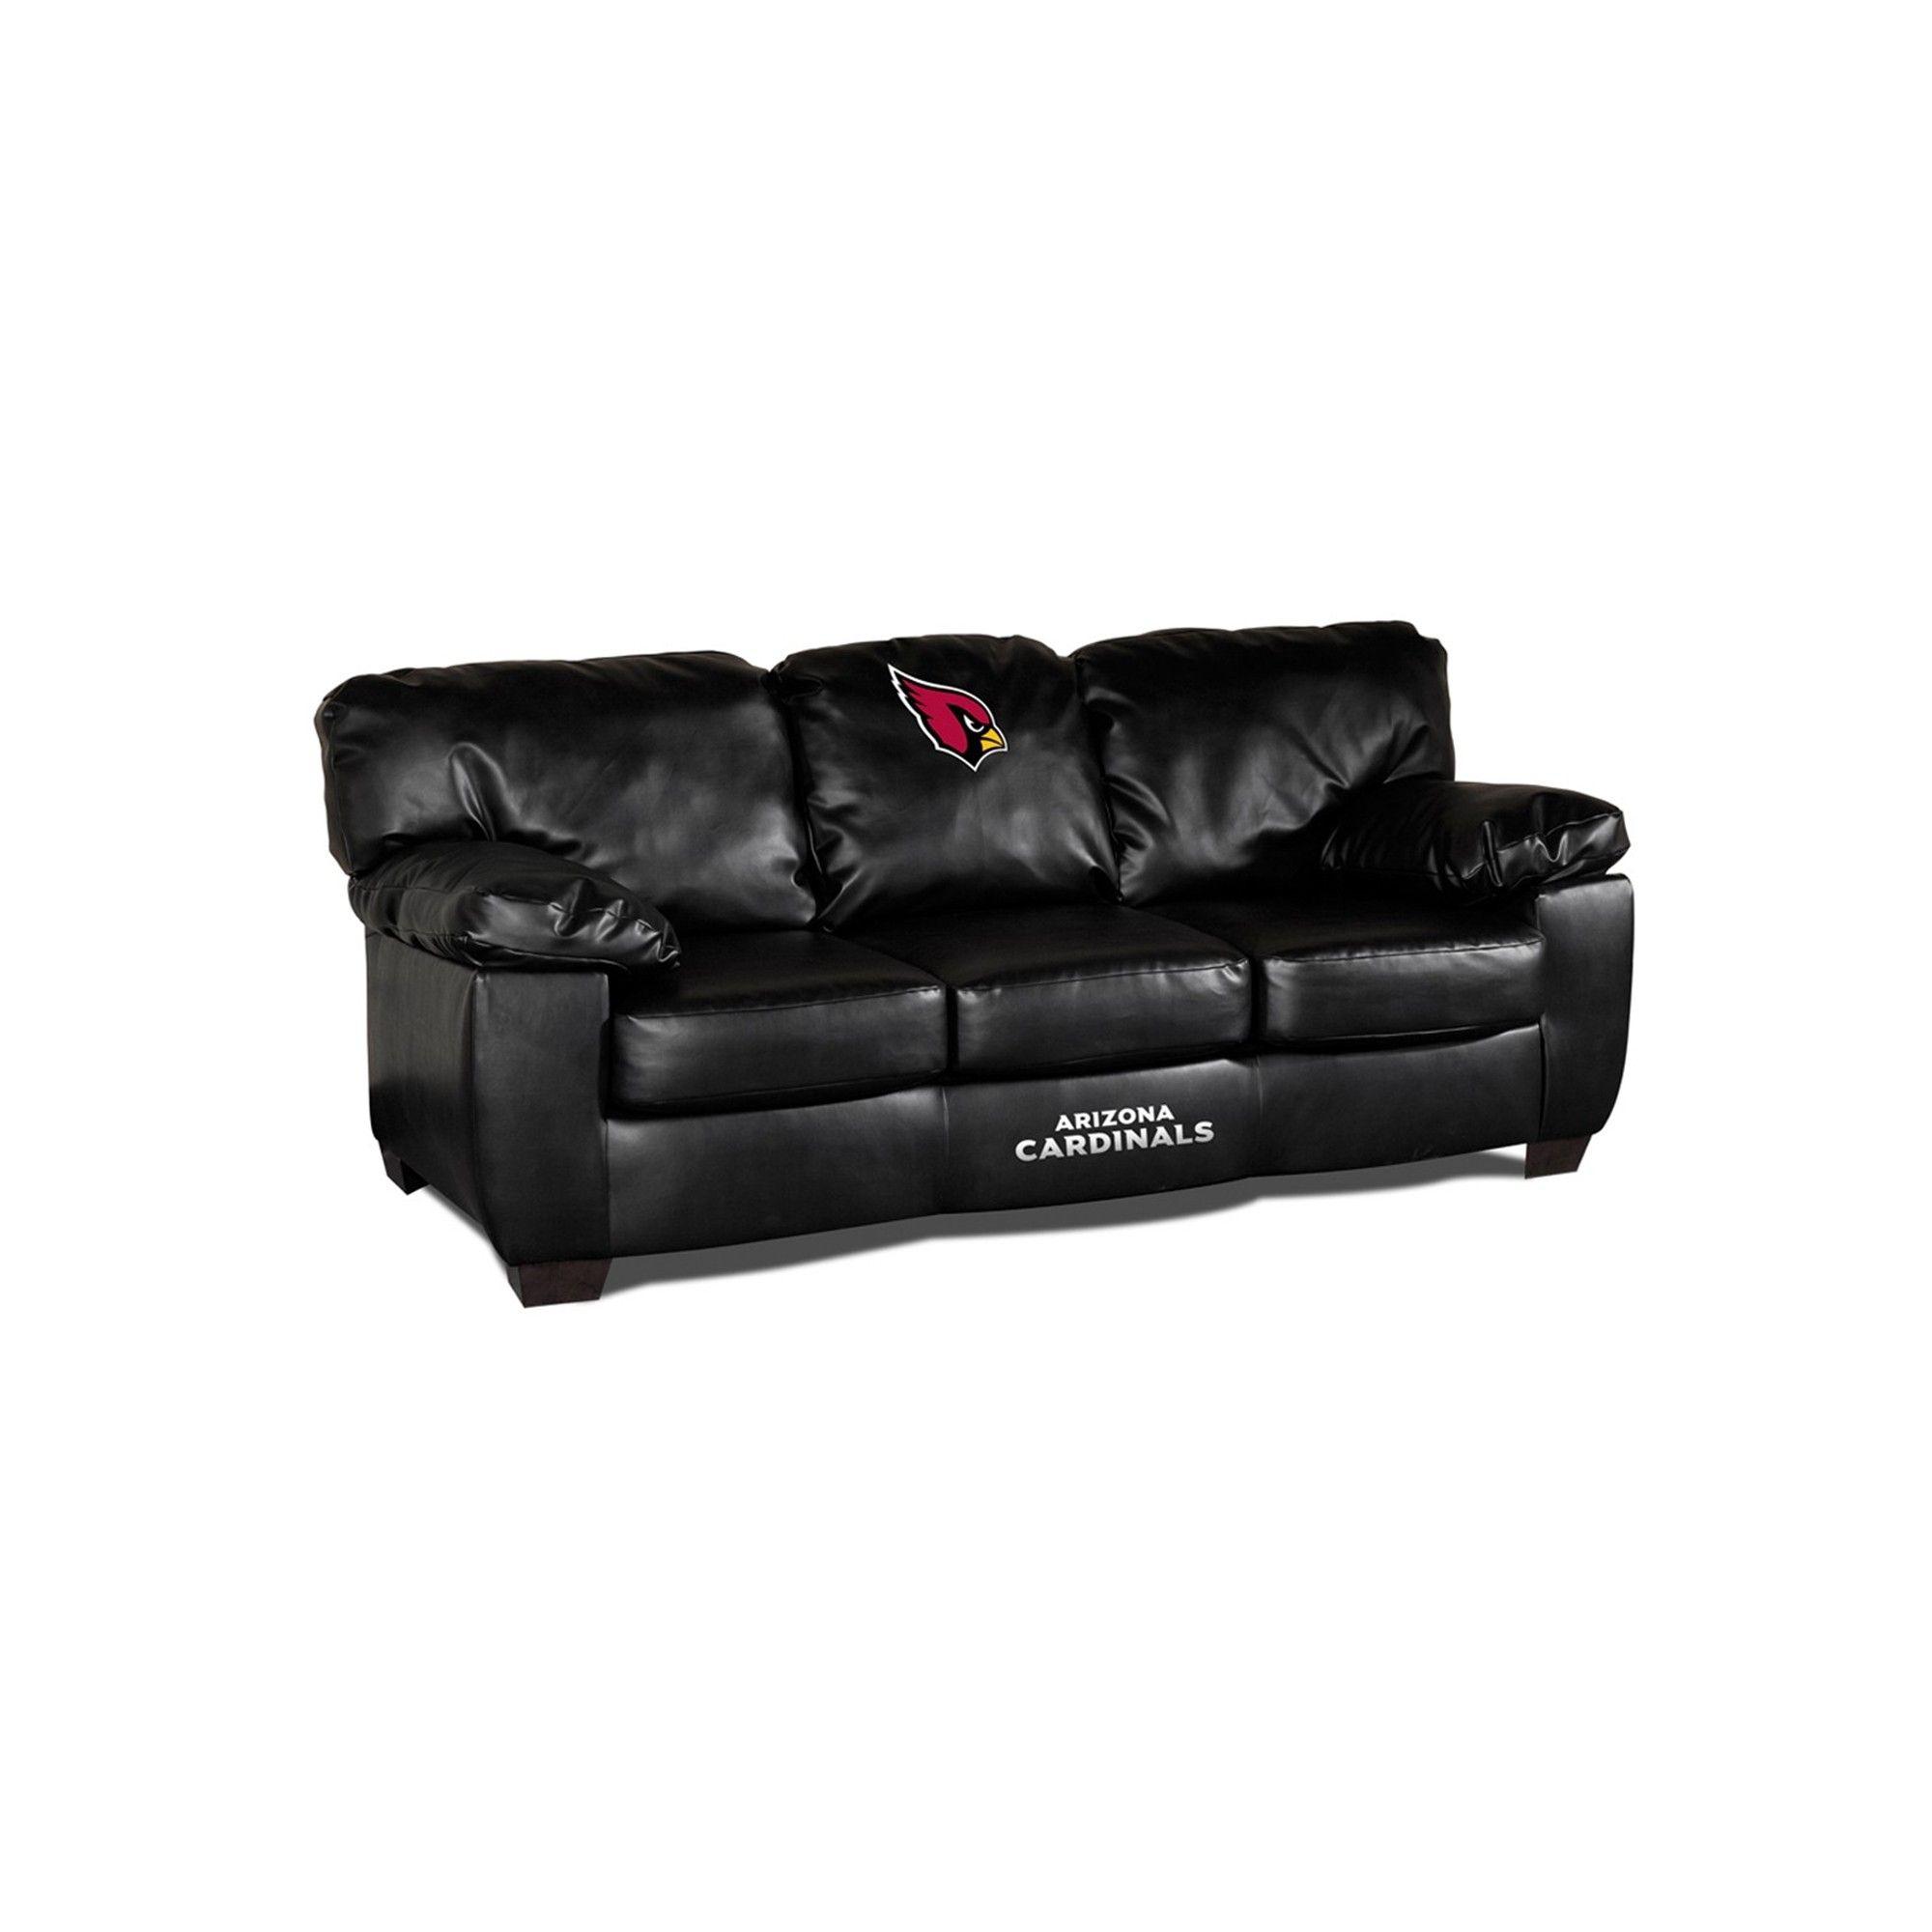 Arizona Cardinals Classic Leather Sofa $1,129.99 Brand